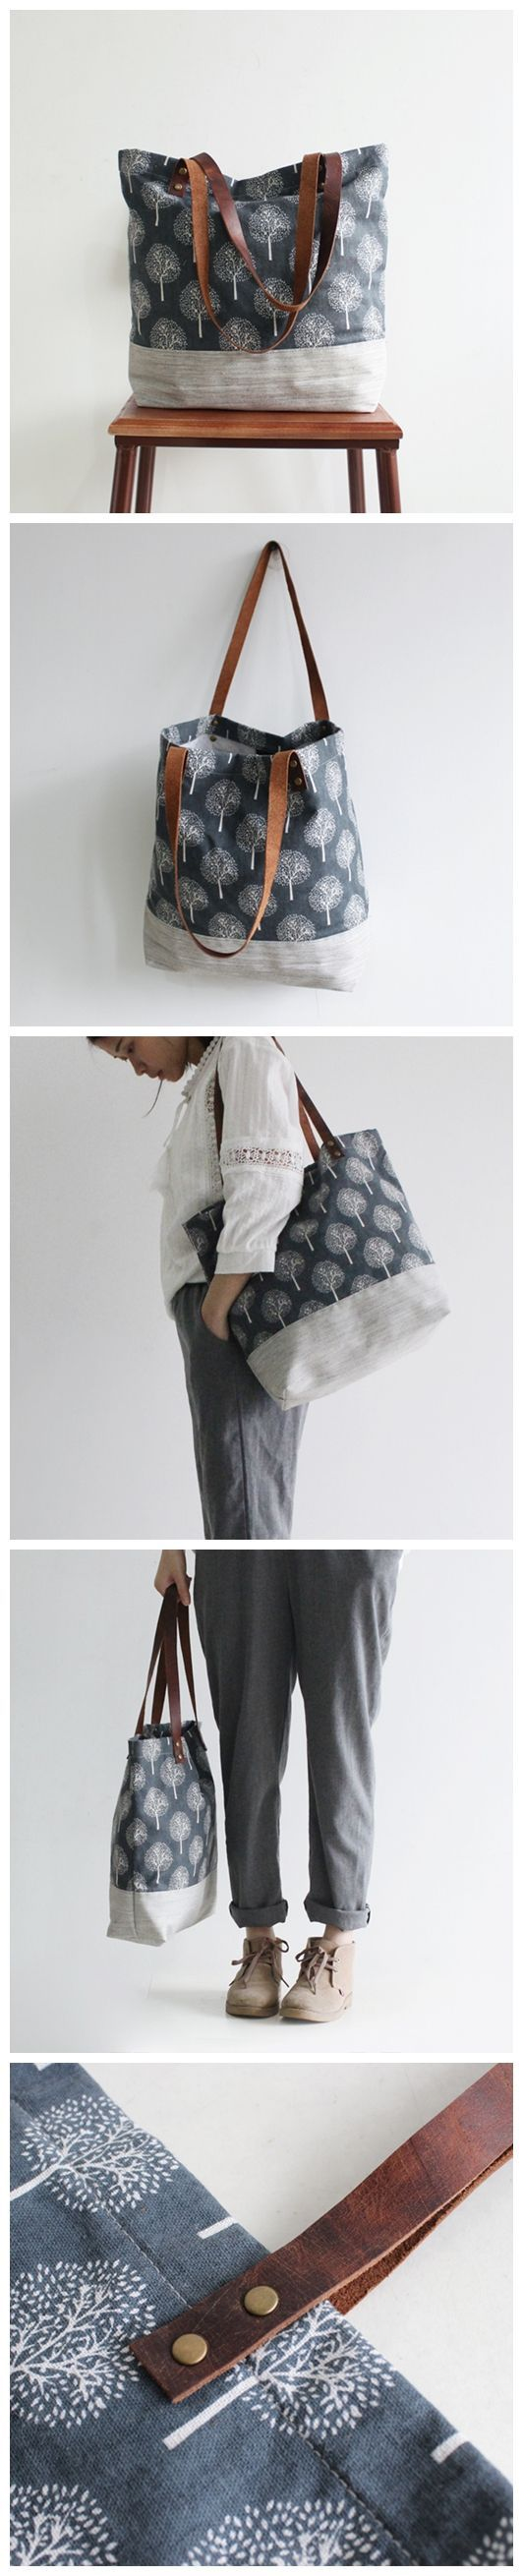 Original Handmade Canvas and Leather Casual Tote Shoulder Bag Carry all Bag Length: 35 cm; Height: 40 cm; Width: 10 cm Idée pour liège/palmier